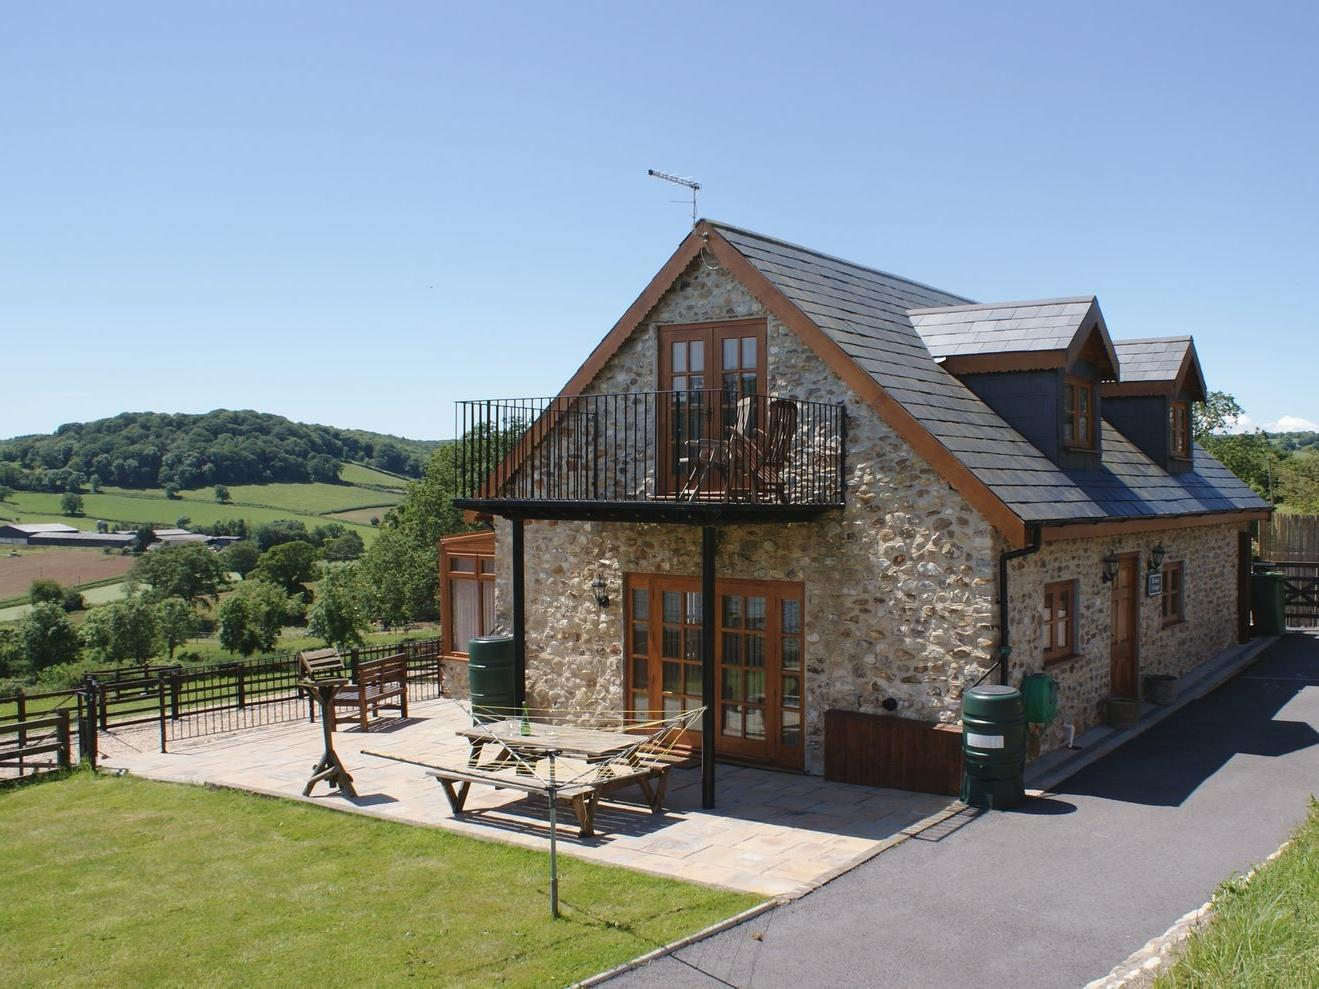 Hiscox Cottage